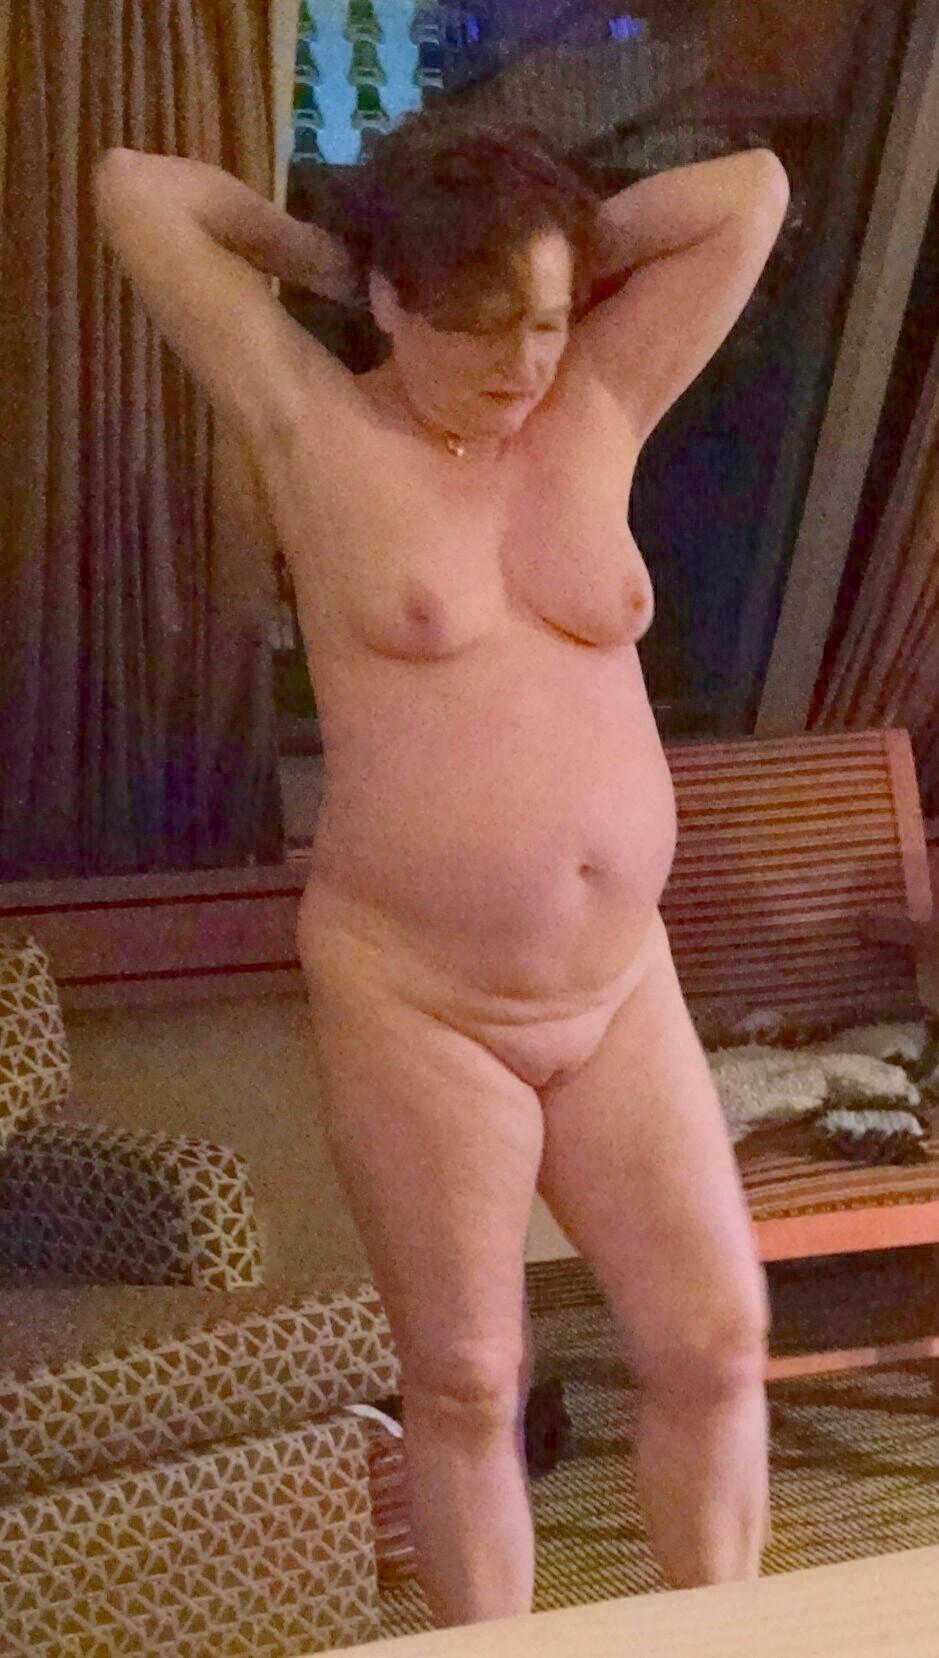 chubby wife naked in hotel-voyeur